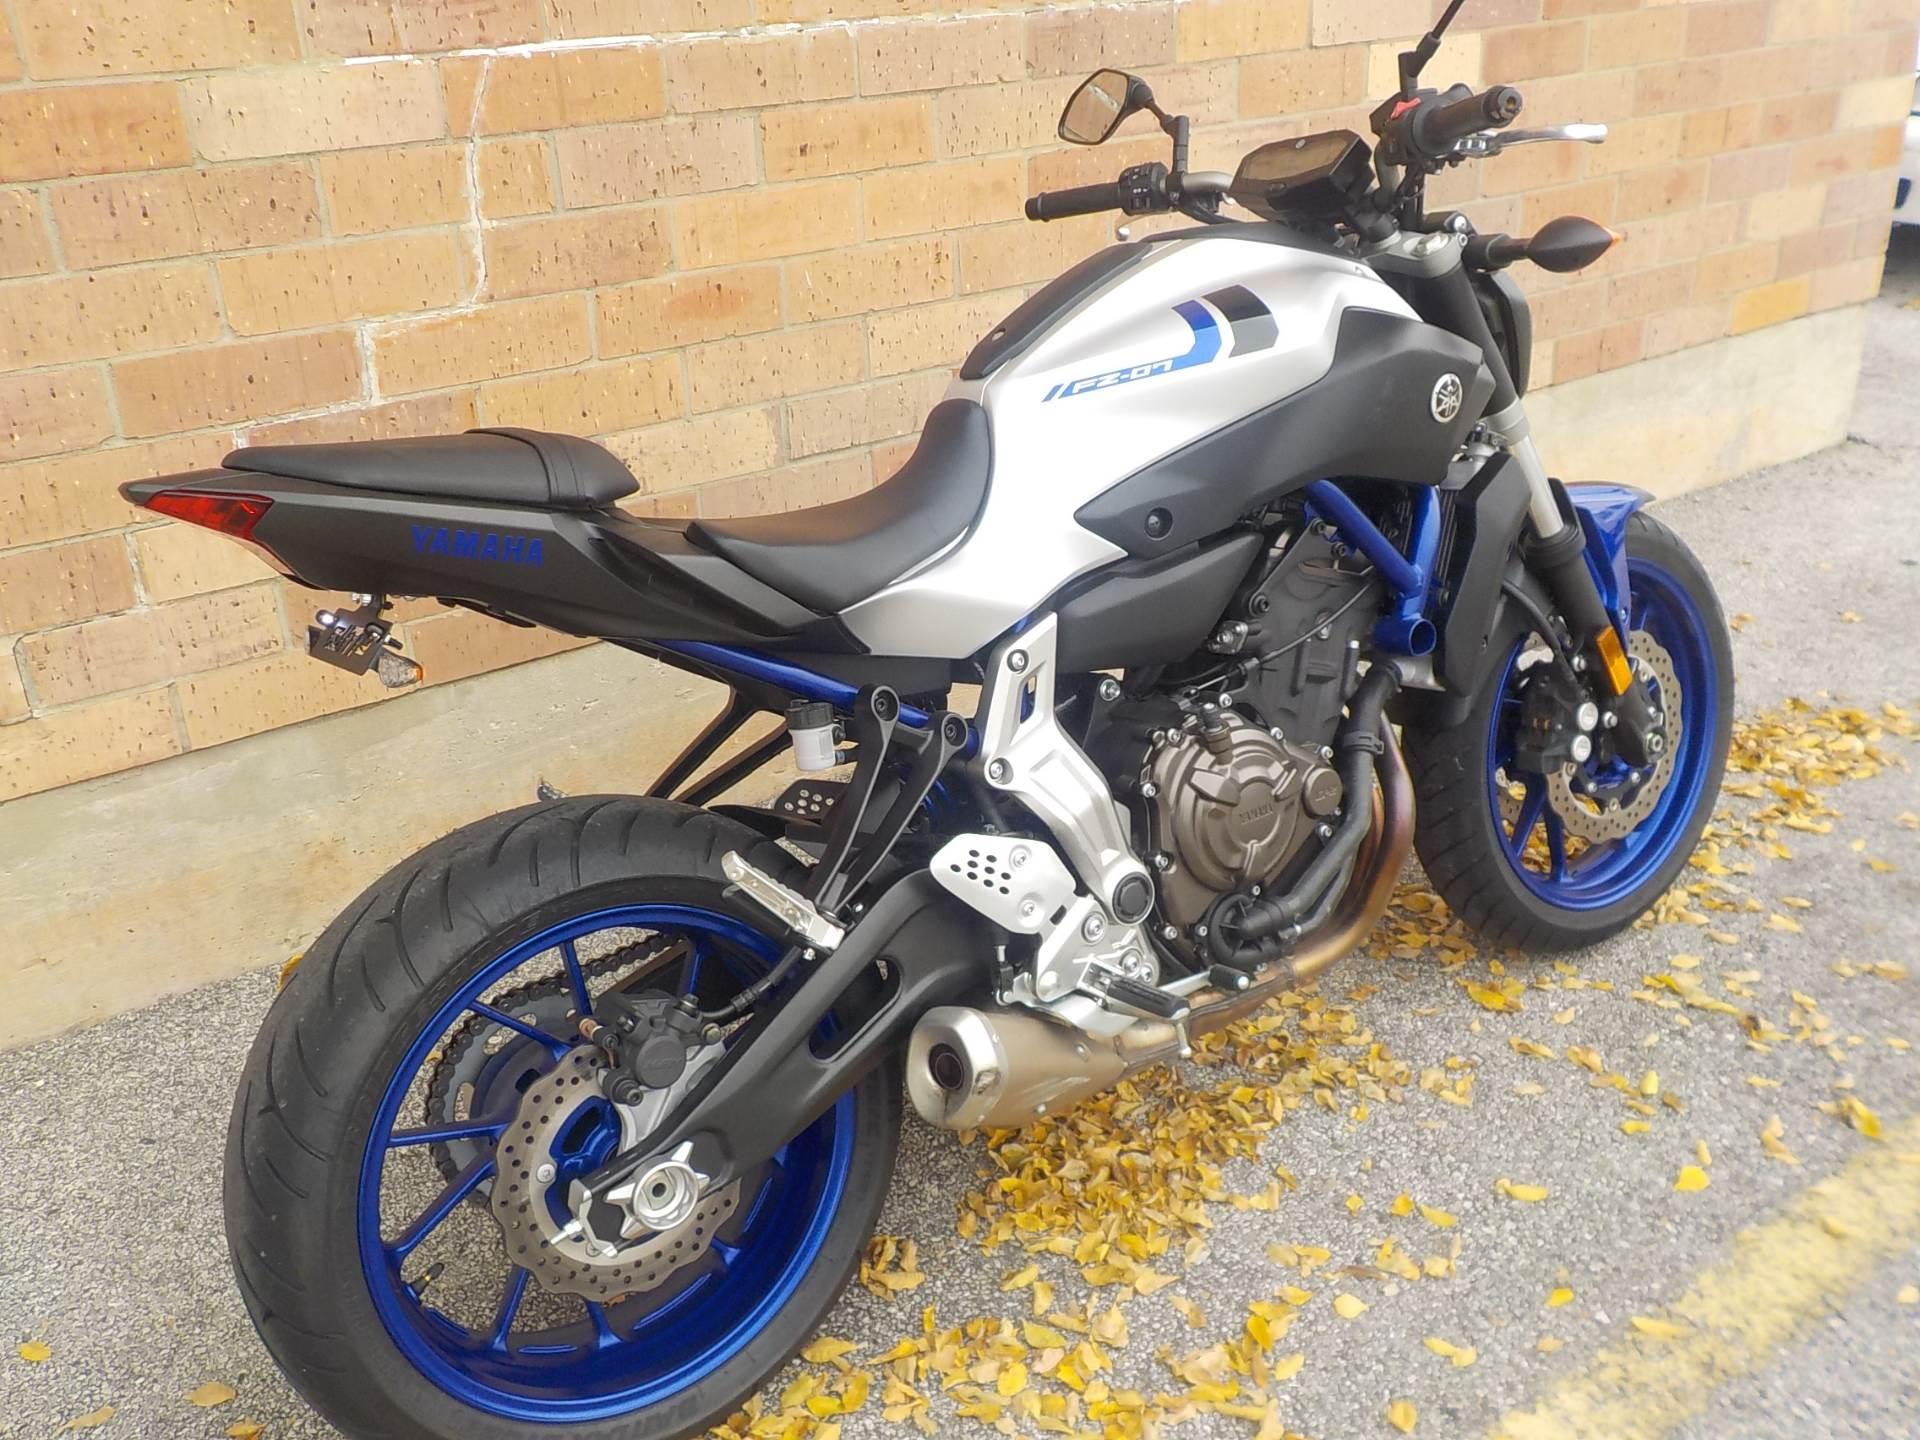 2016 Yamaha FZ-07 for sale near El Cajon, California 92021